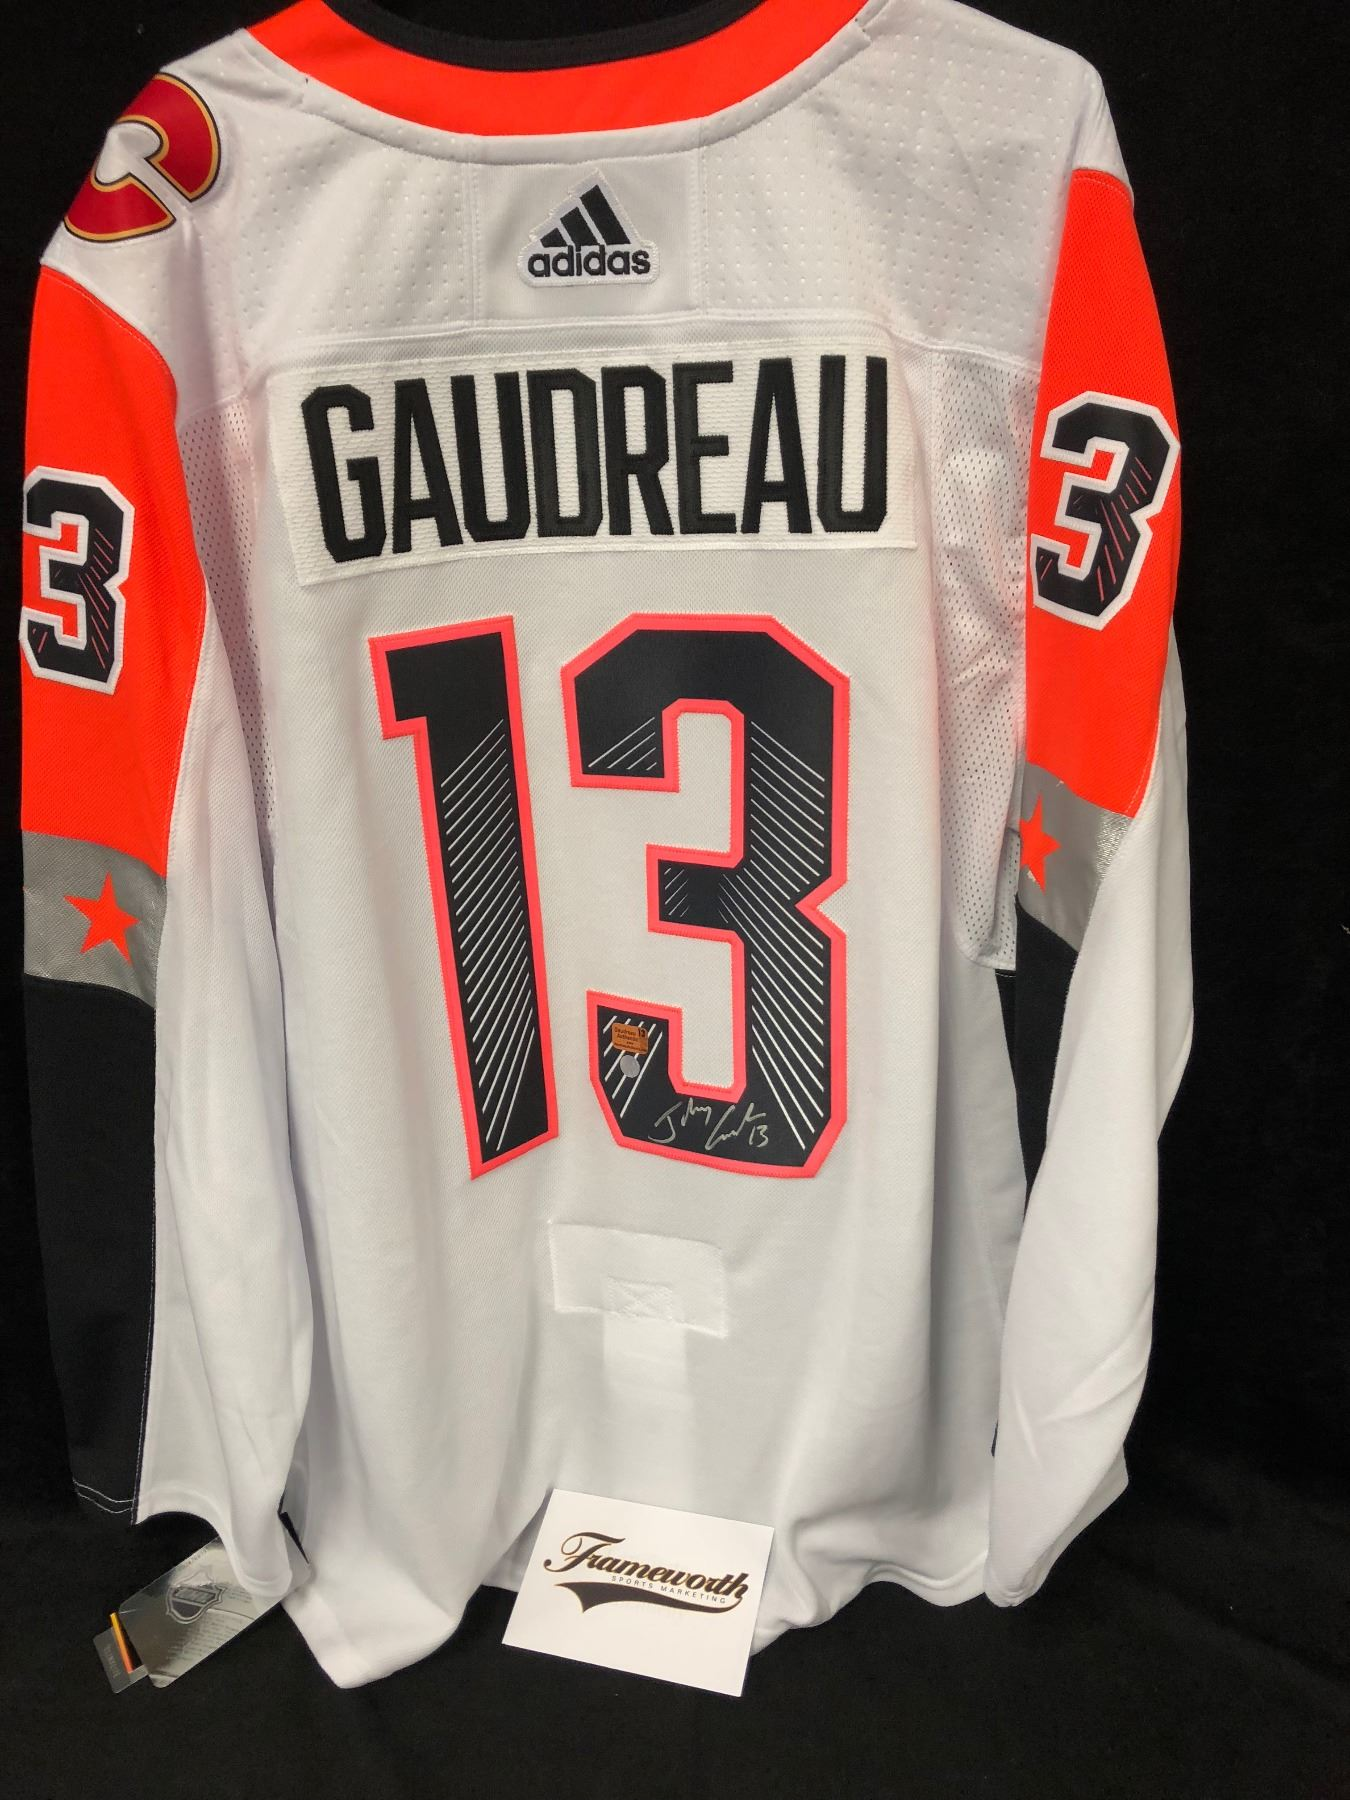 brand new ed9cc 166dc JOHNNY GAUDREAU AUTOGRAPHED NHL ALL-STAR JERSEY W/ FRAMEWORTH COA